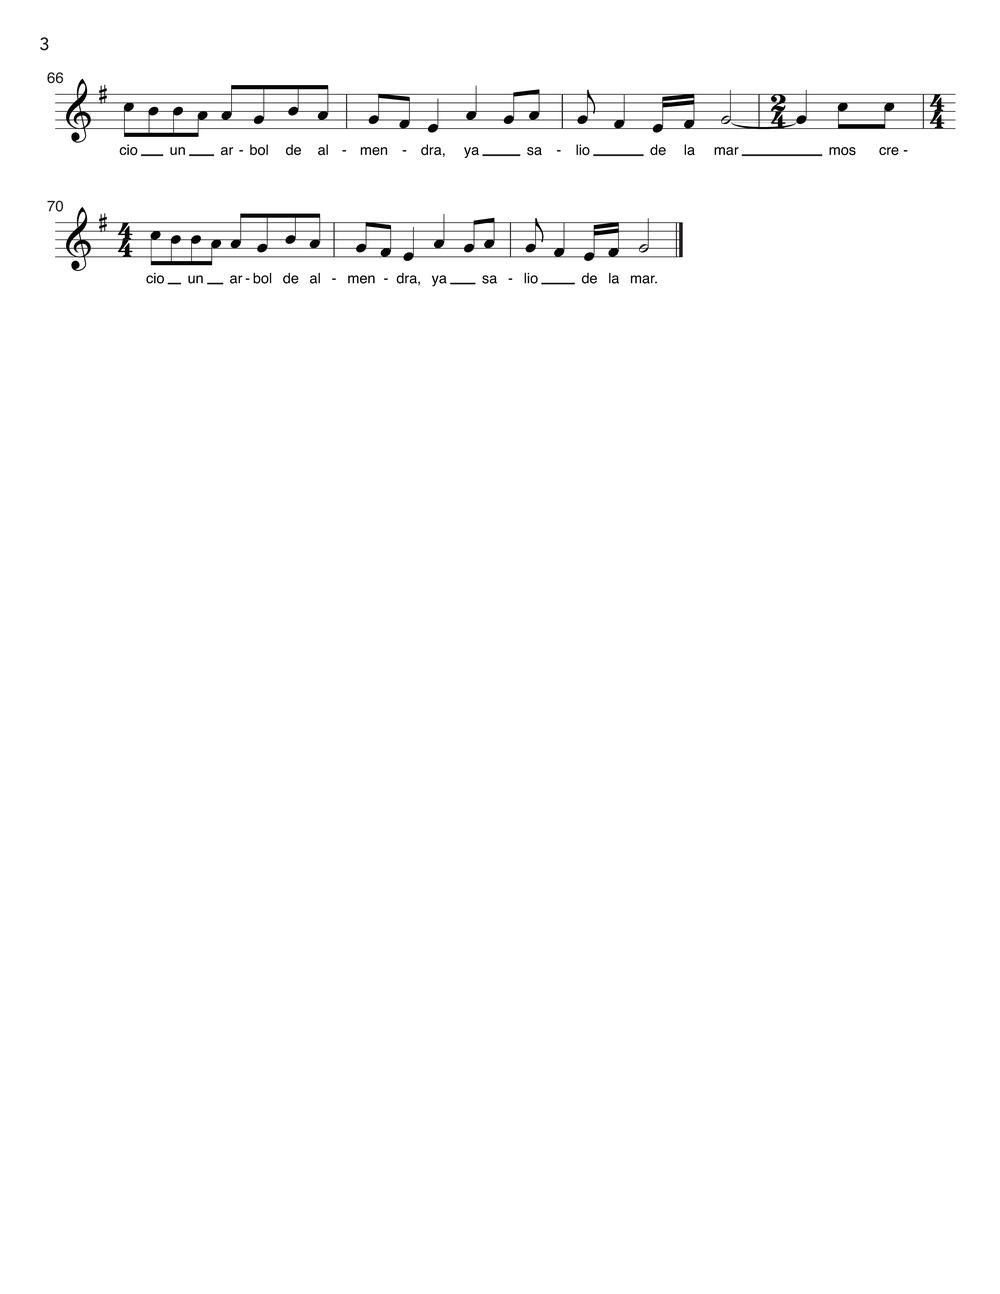 Ladino_Sephardic Music_Page_14.png